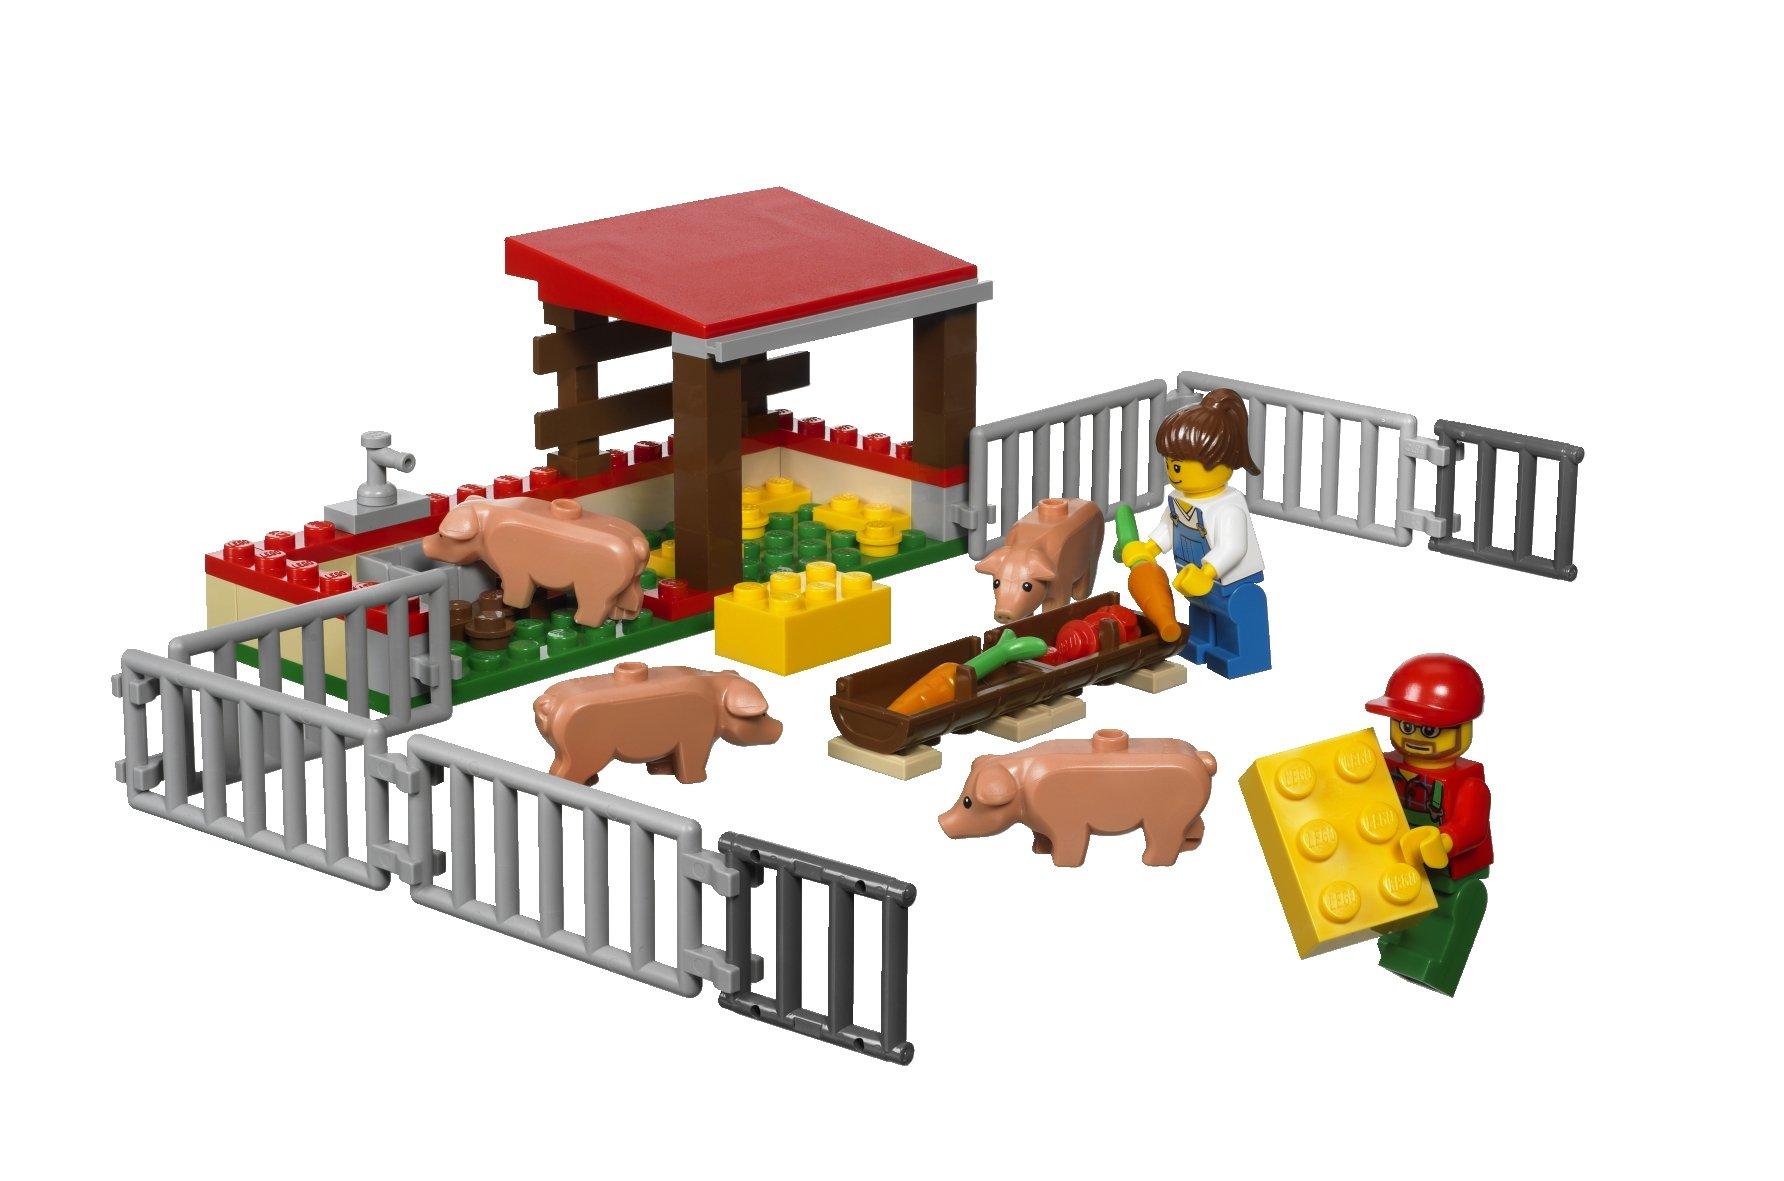 LEGO-City-7684-Recinto-maiali-trattore